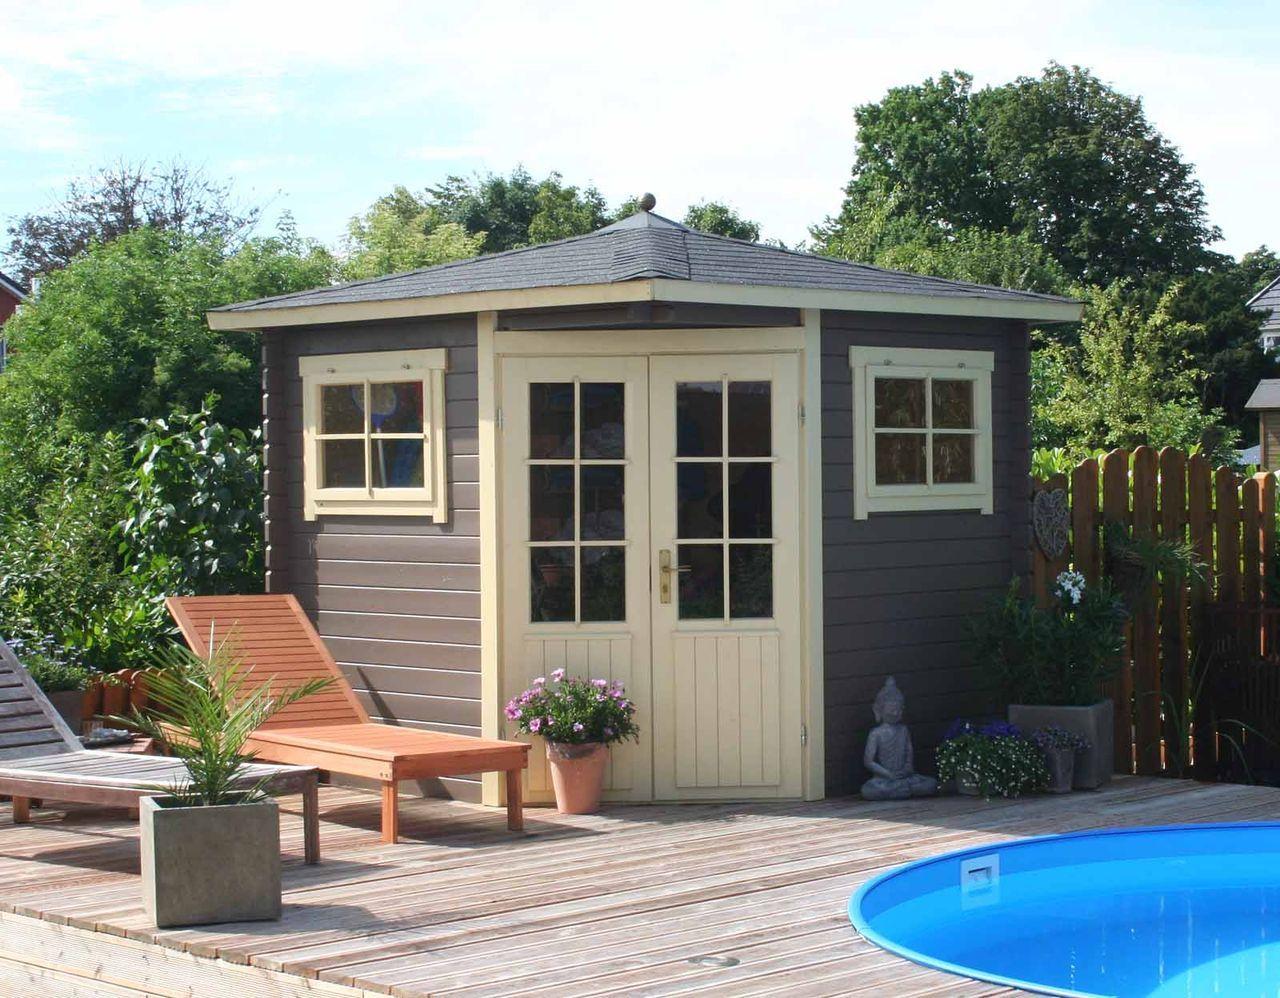 5 eck gartenhaus modell sunny b gartenh user modell und g rten. Black Bedroom Furniture Sets. Home Design Ideas